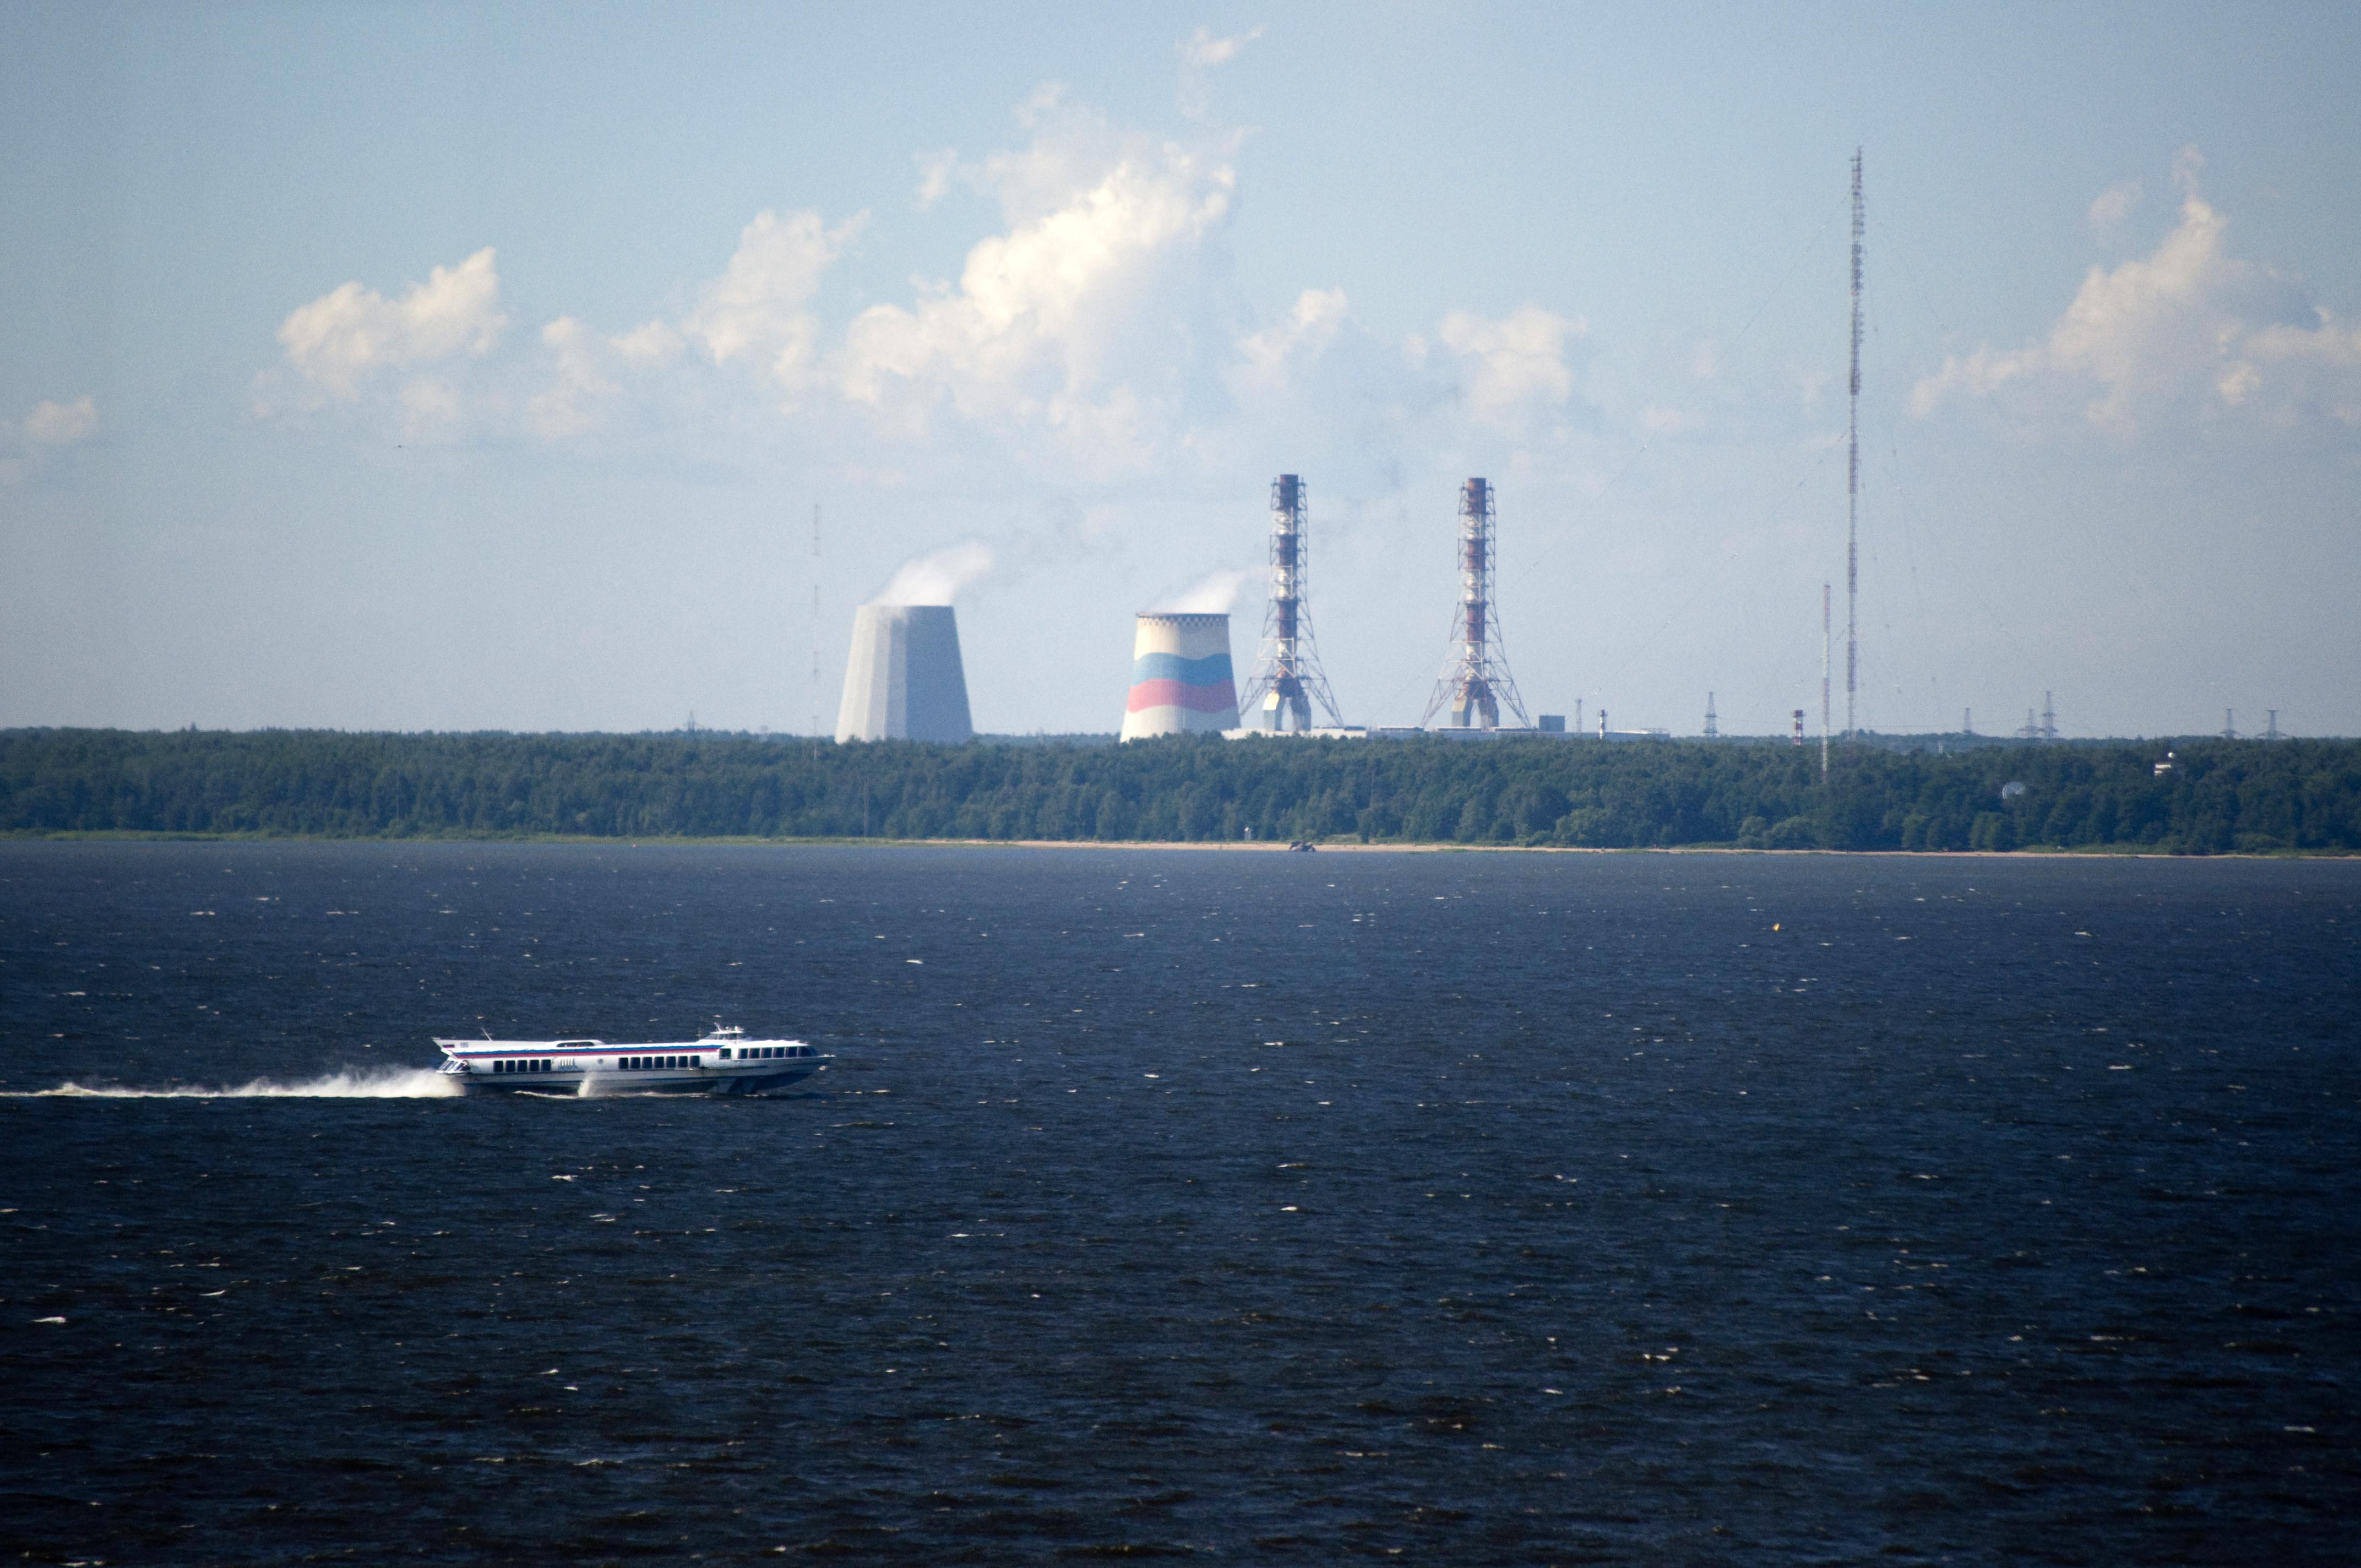 File:RU - Saint Petersburg - Energy - Hydrofoil - Nuclear - Non-renewable Energy - Nuclear Power Plant (4891300113).jpg